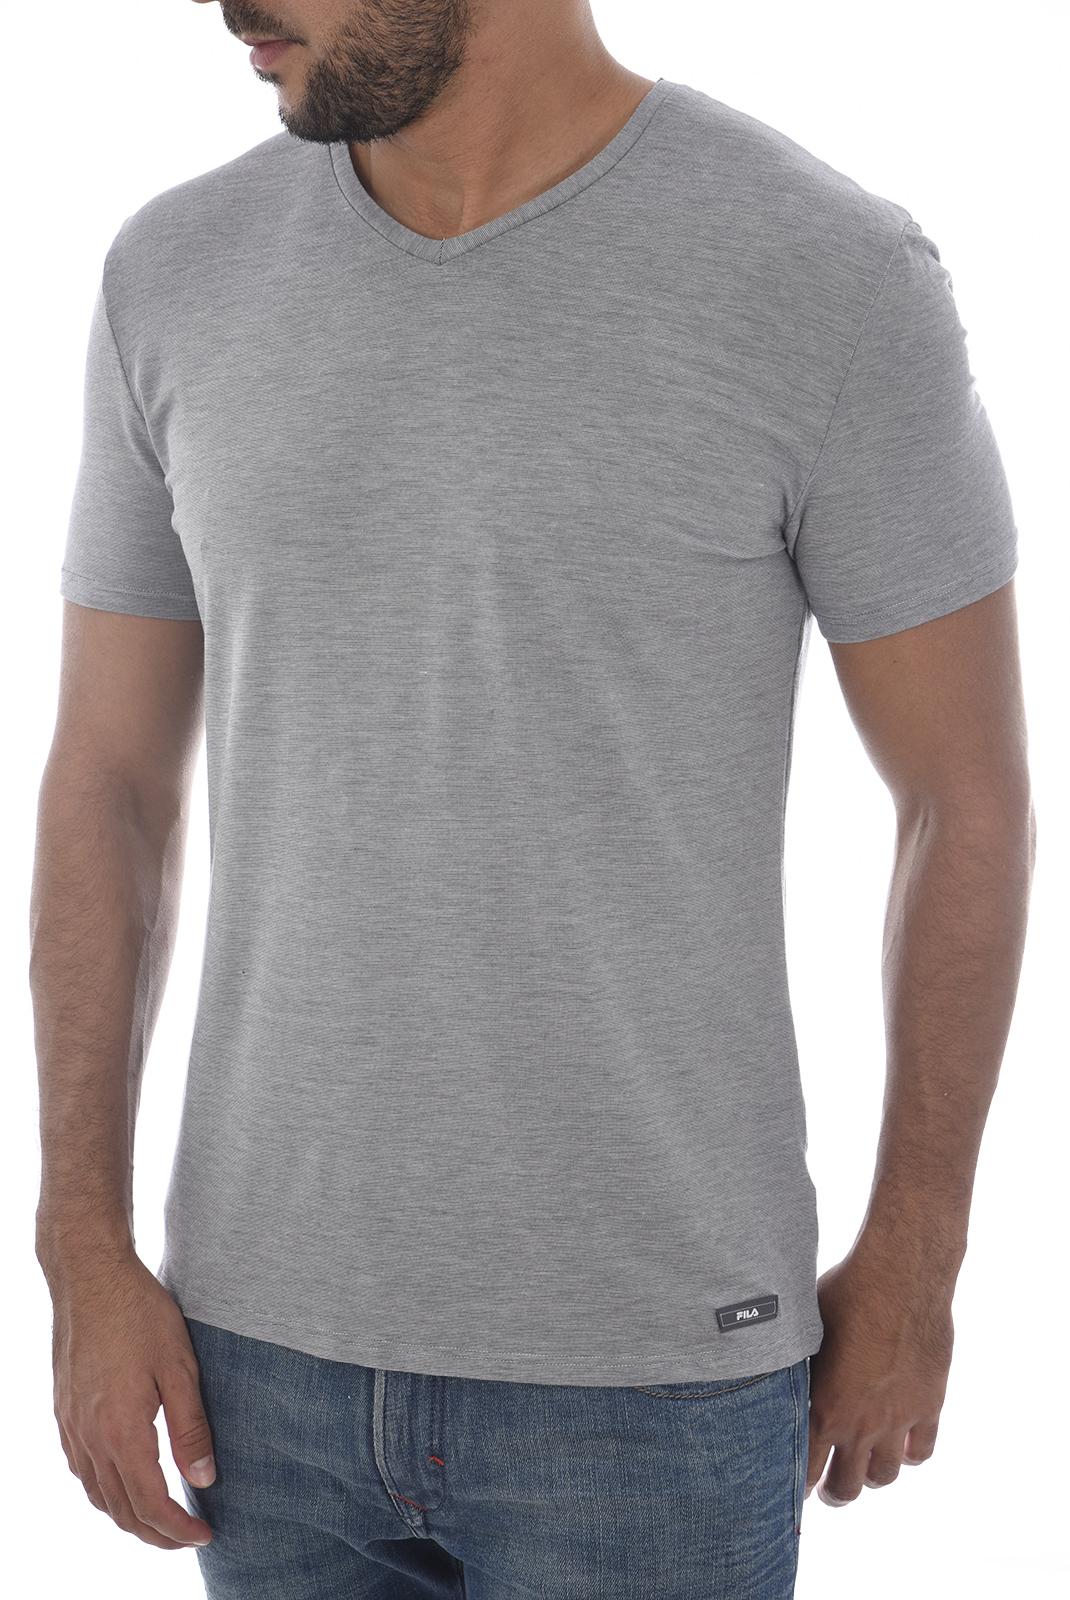 Fila Shirt Homme Gris Stretch F06i4 Tee jUpLqGSzVM